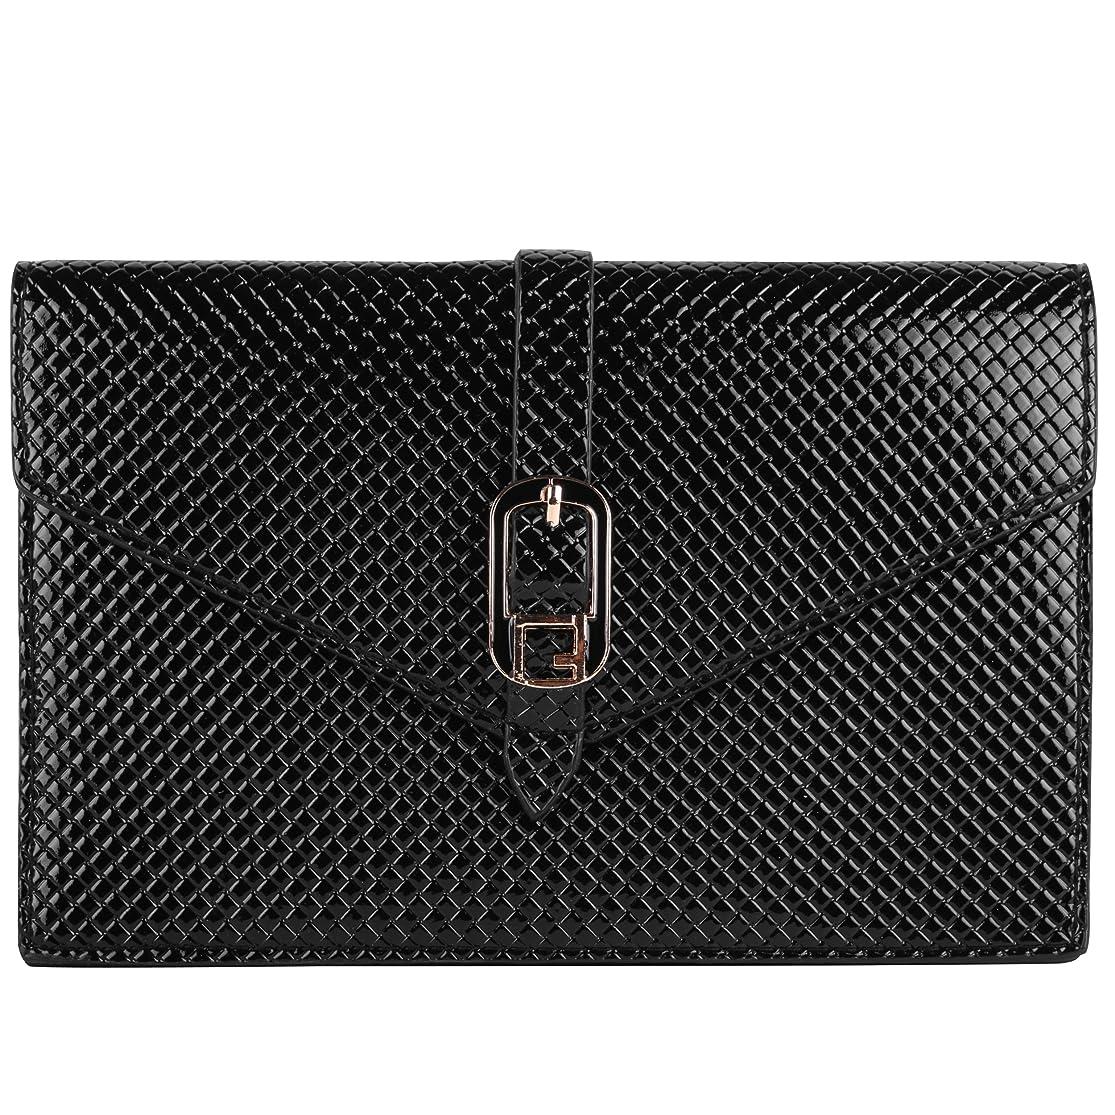 VanGoddy Diamond Clutch Wallet Case for BLU Neo 4.5 / Neo 3.5 / Vivo 4.8 HD Unlocked Phones (Black) dxqmoxnt2